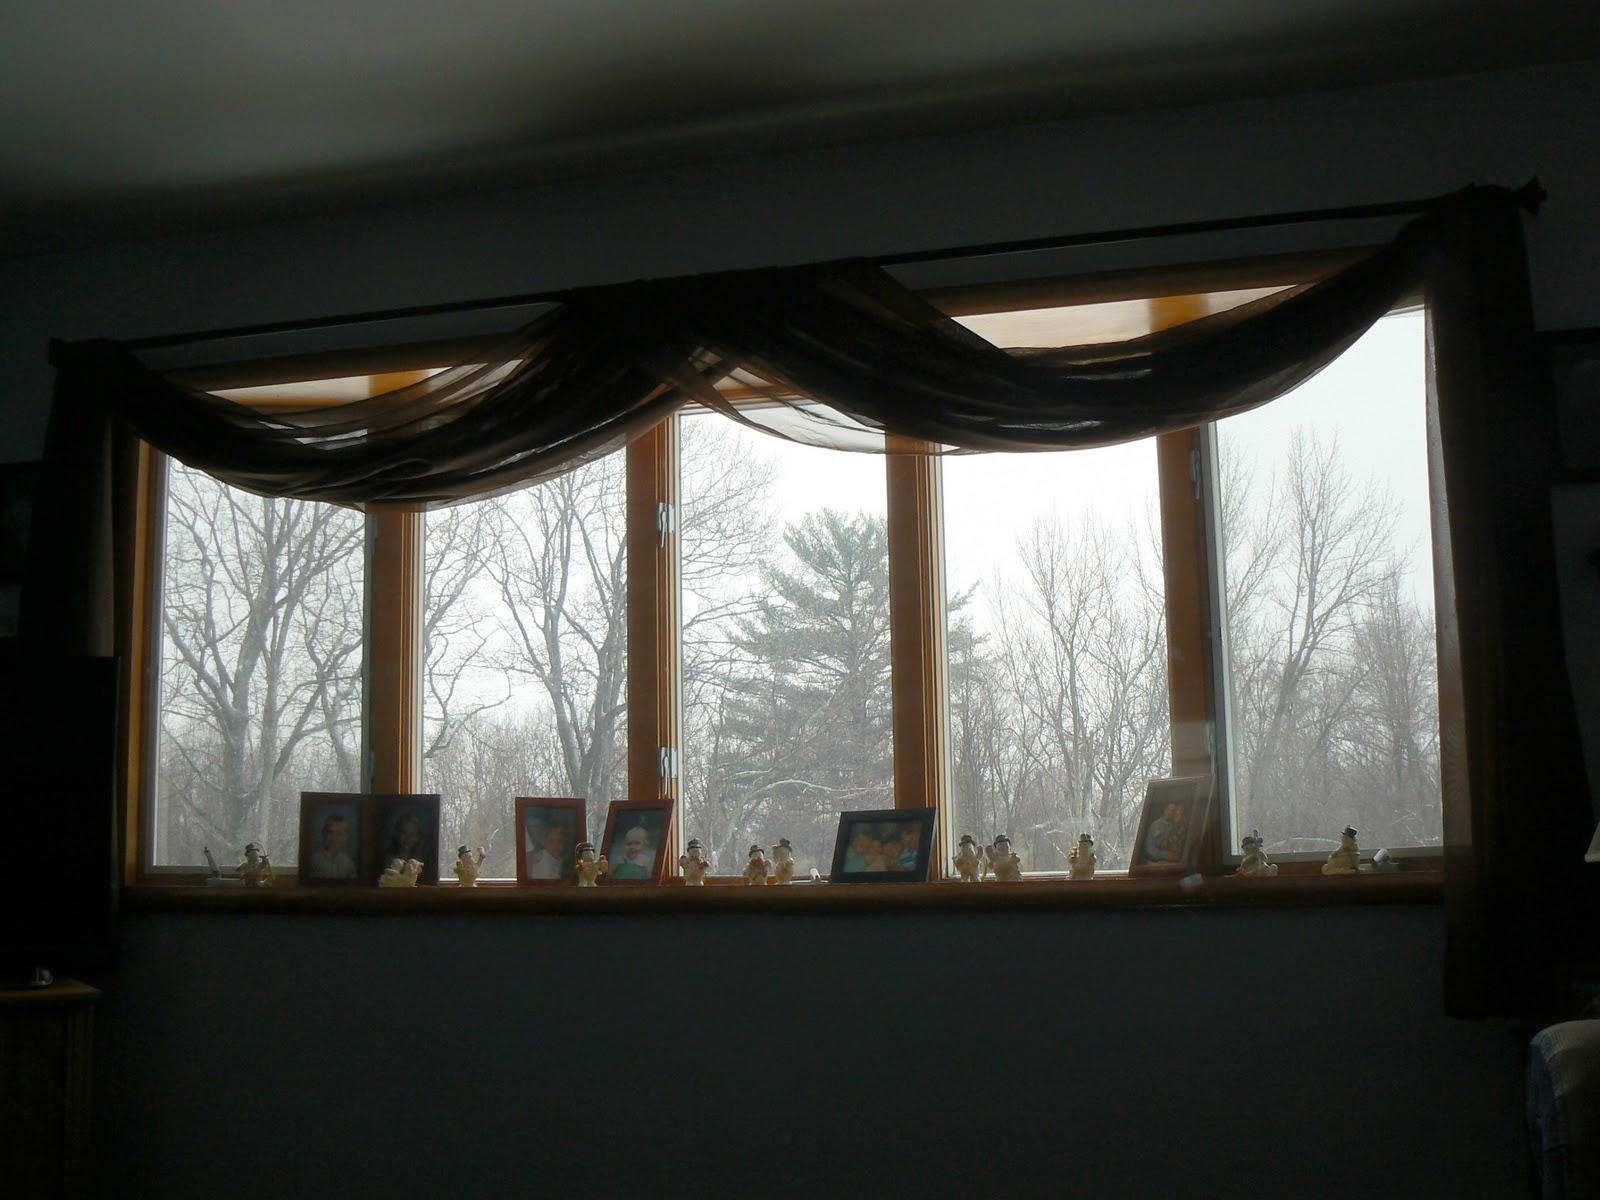 Whimsical Words: Big bay window